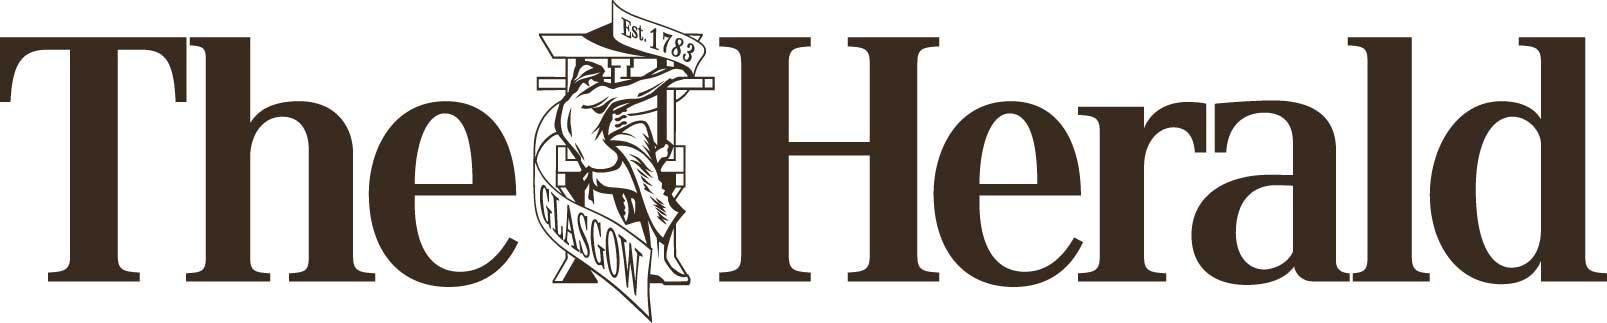 Herald Scotland logo